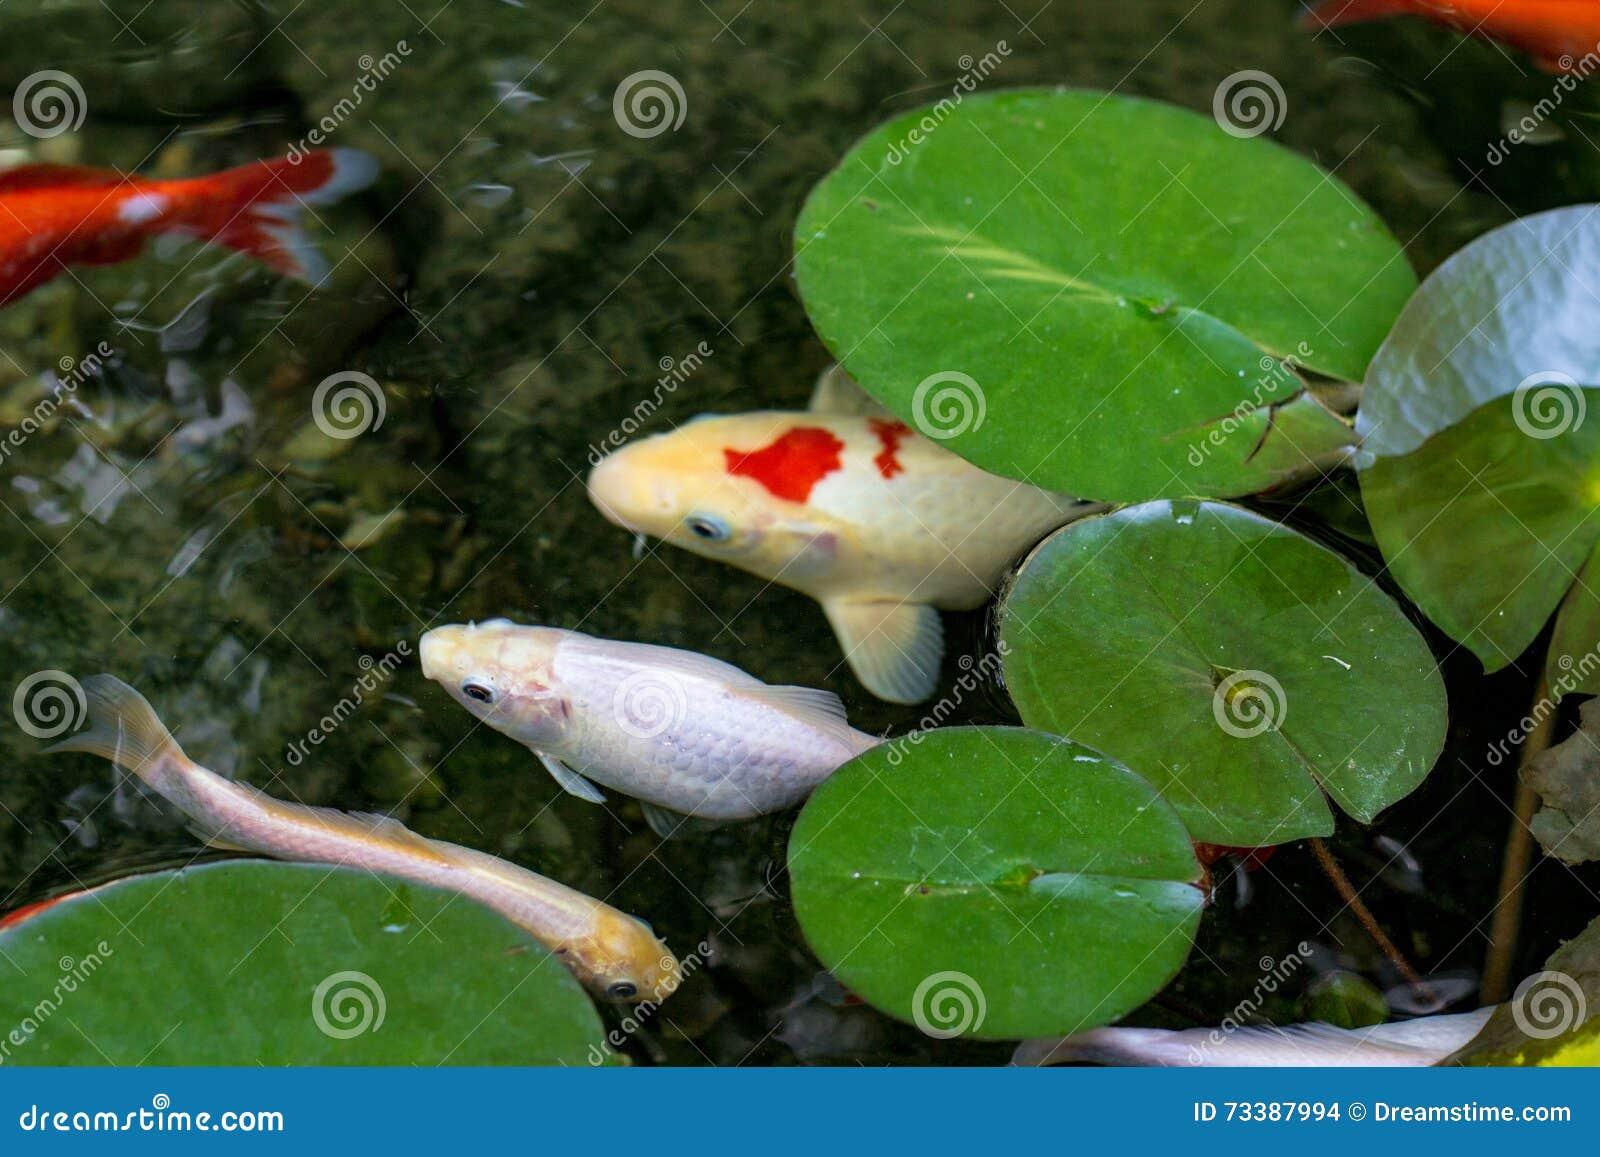 Koi pond stock photo image 73387994 for Koi fish pond lotus